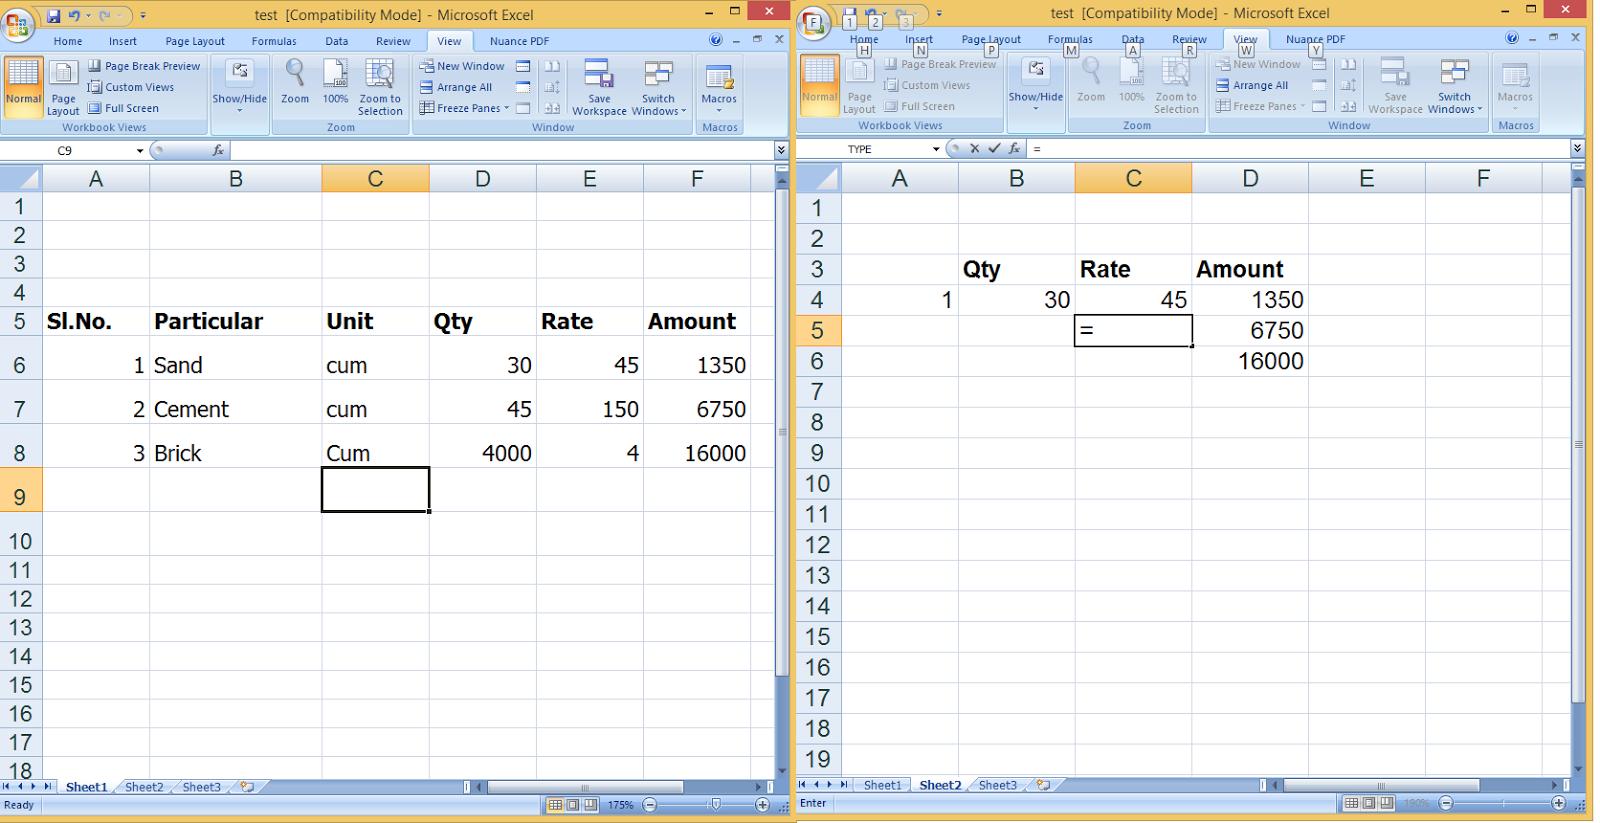 How to Link Formulas inbetween Worksheets in MS Excel